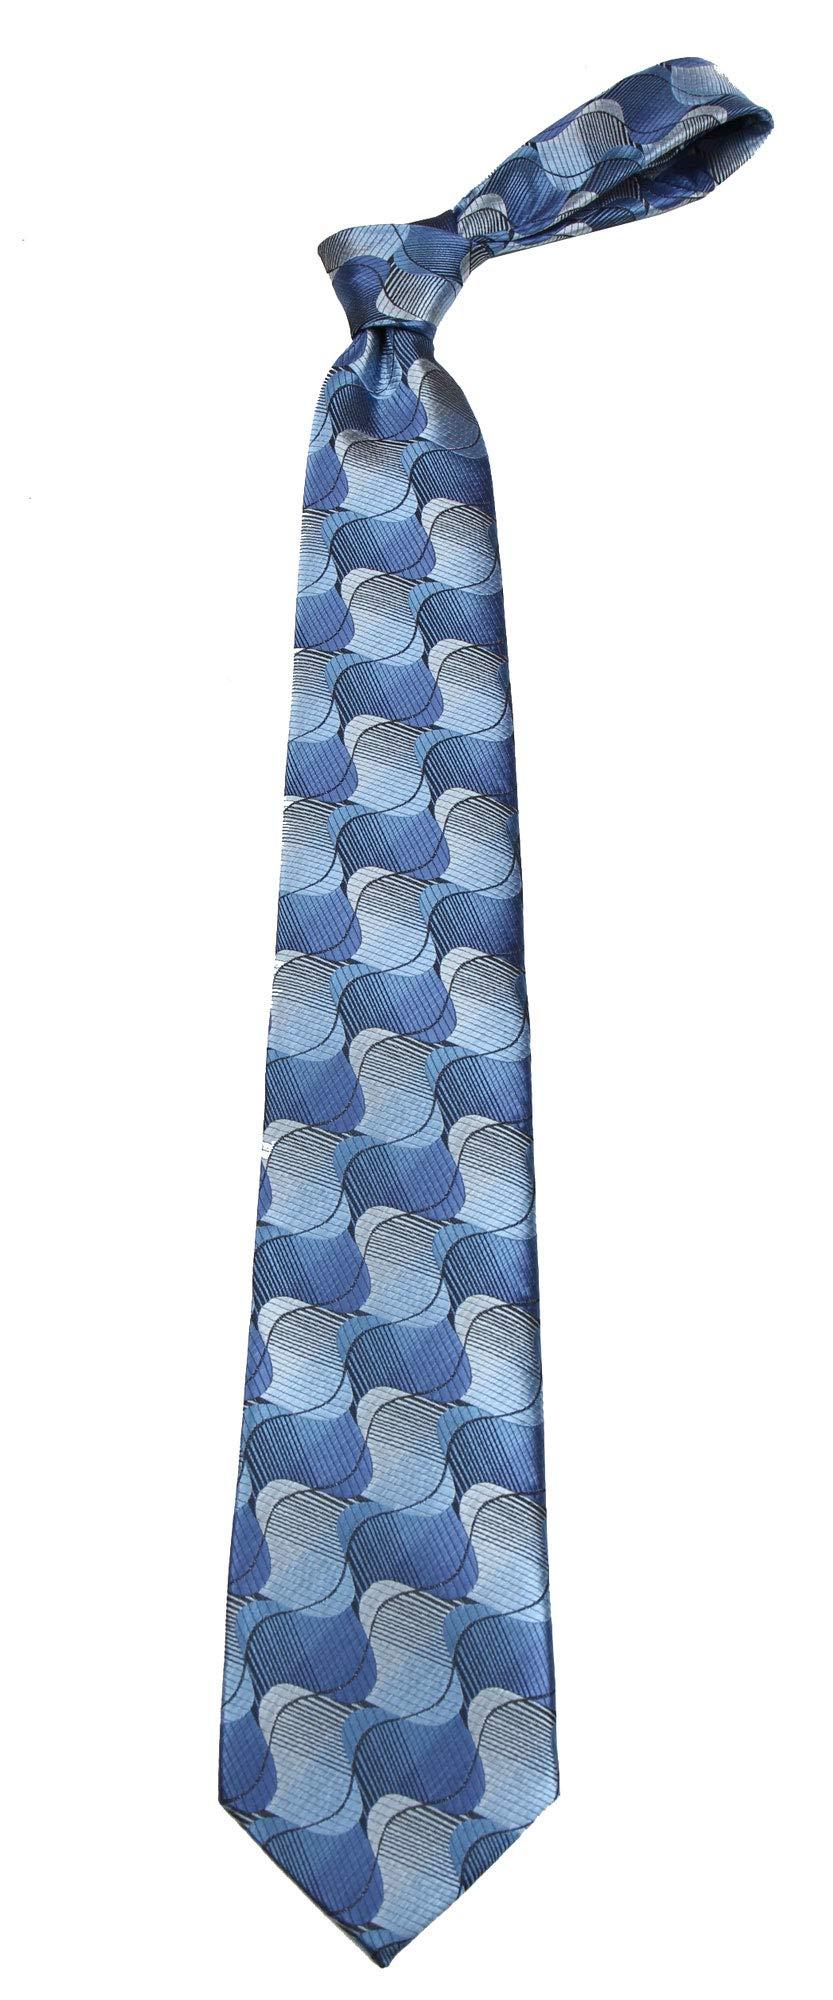 B-11697 - Boys Youth Blue Pattern Designer Necktie Ties